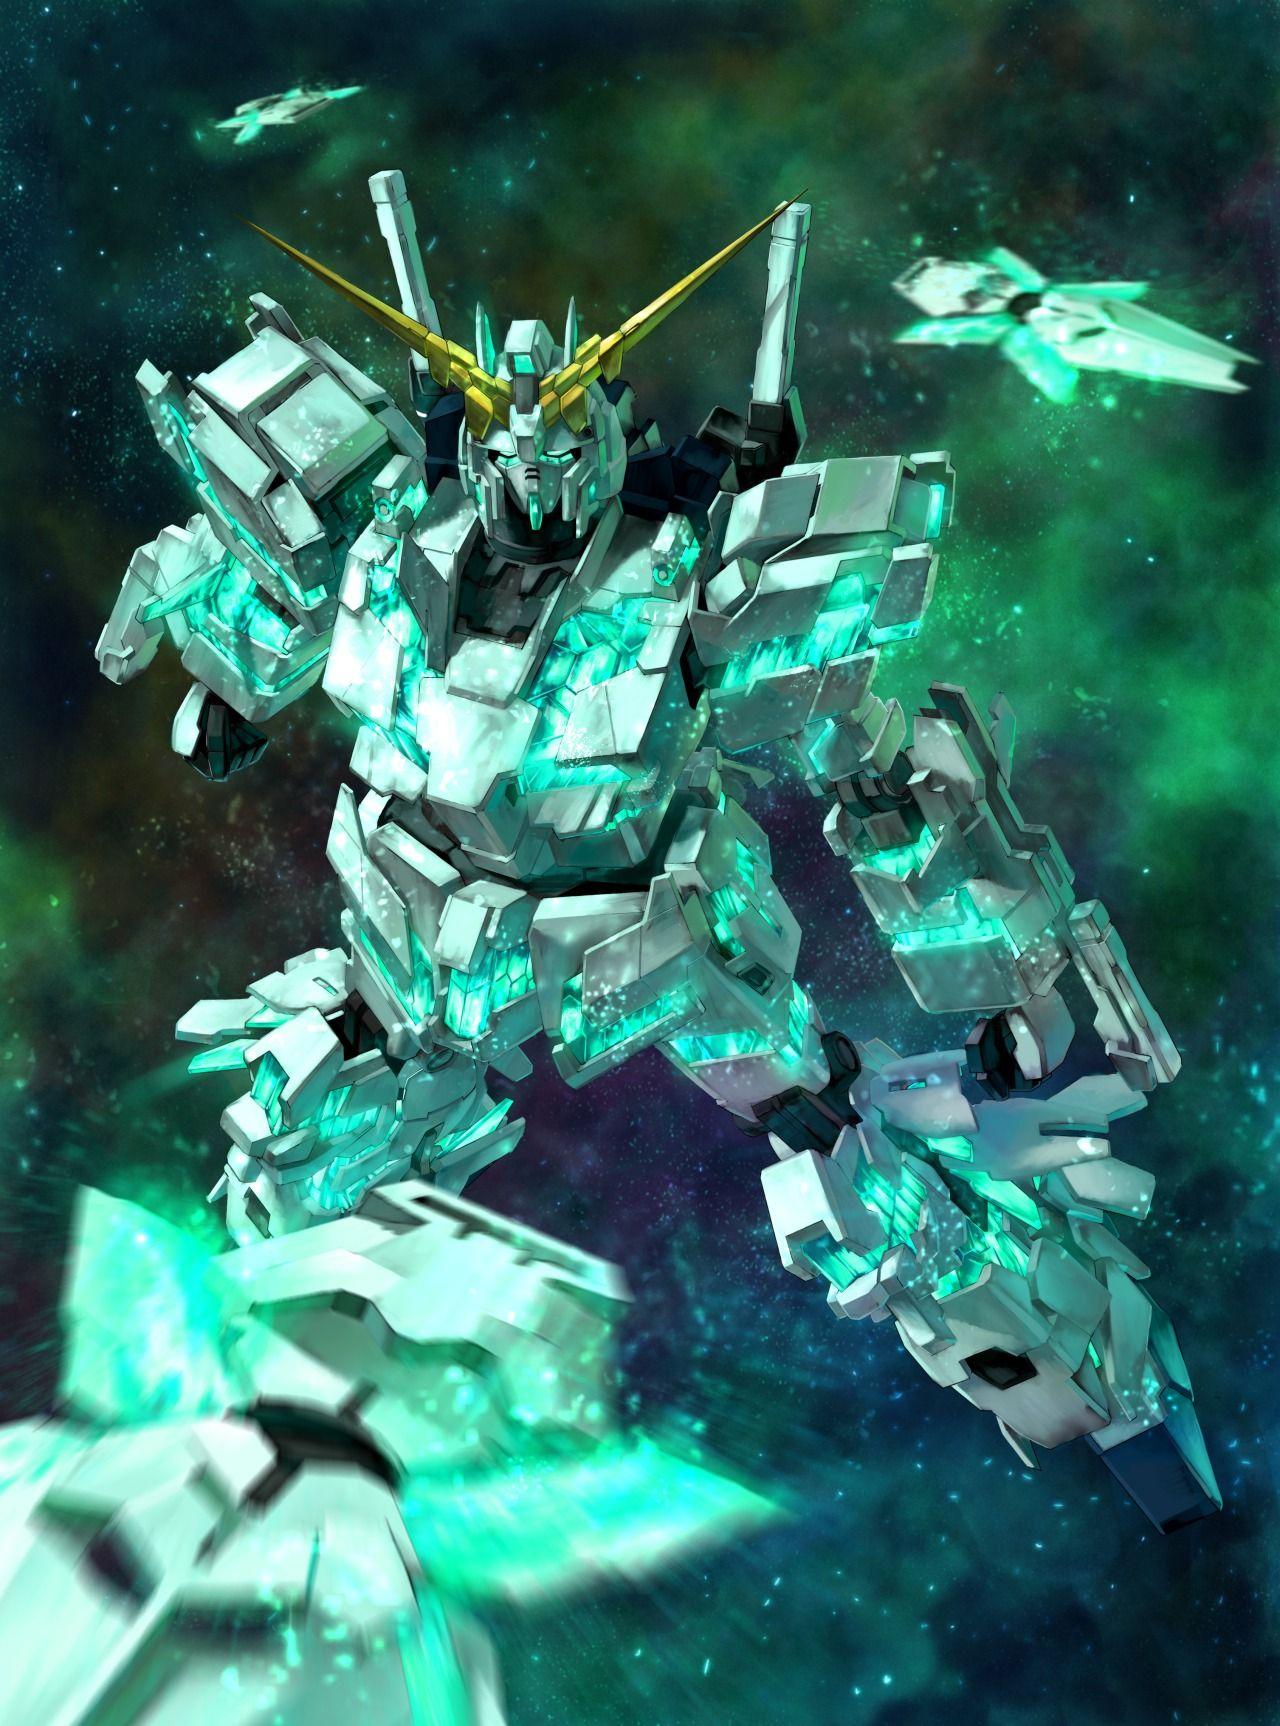 Pin by Malcz Allen on Gundam Gundam wallpapers, Unicorn